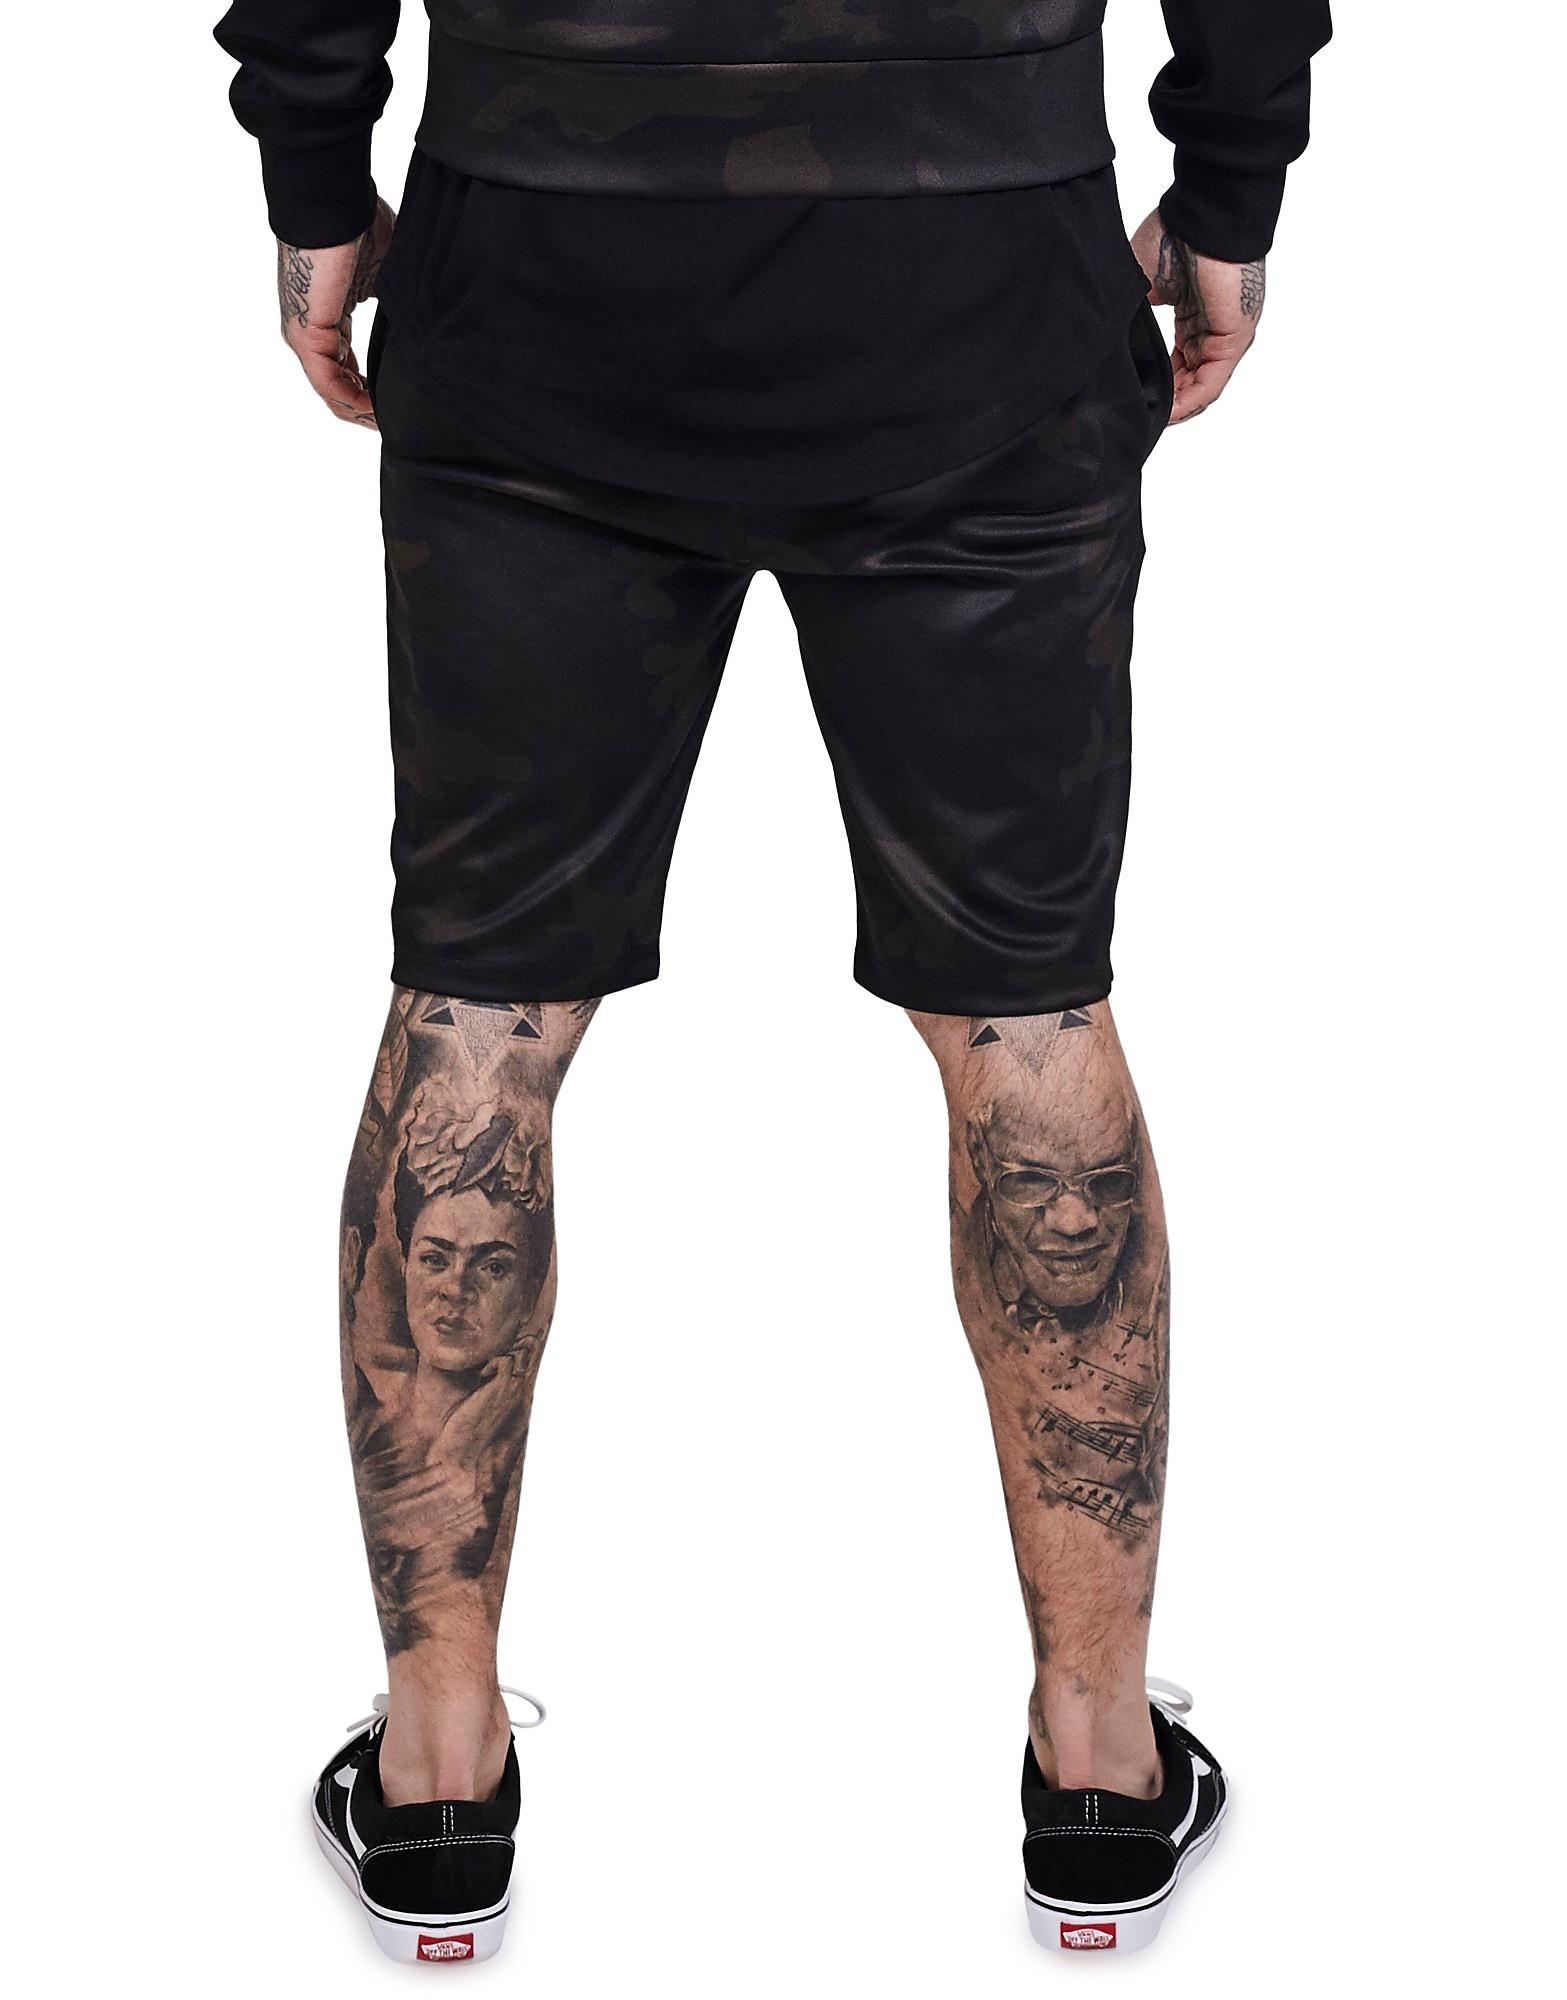 SikSilk Poly Tricot Gym Shorts